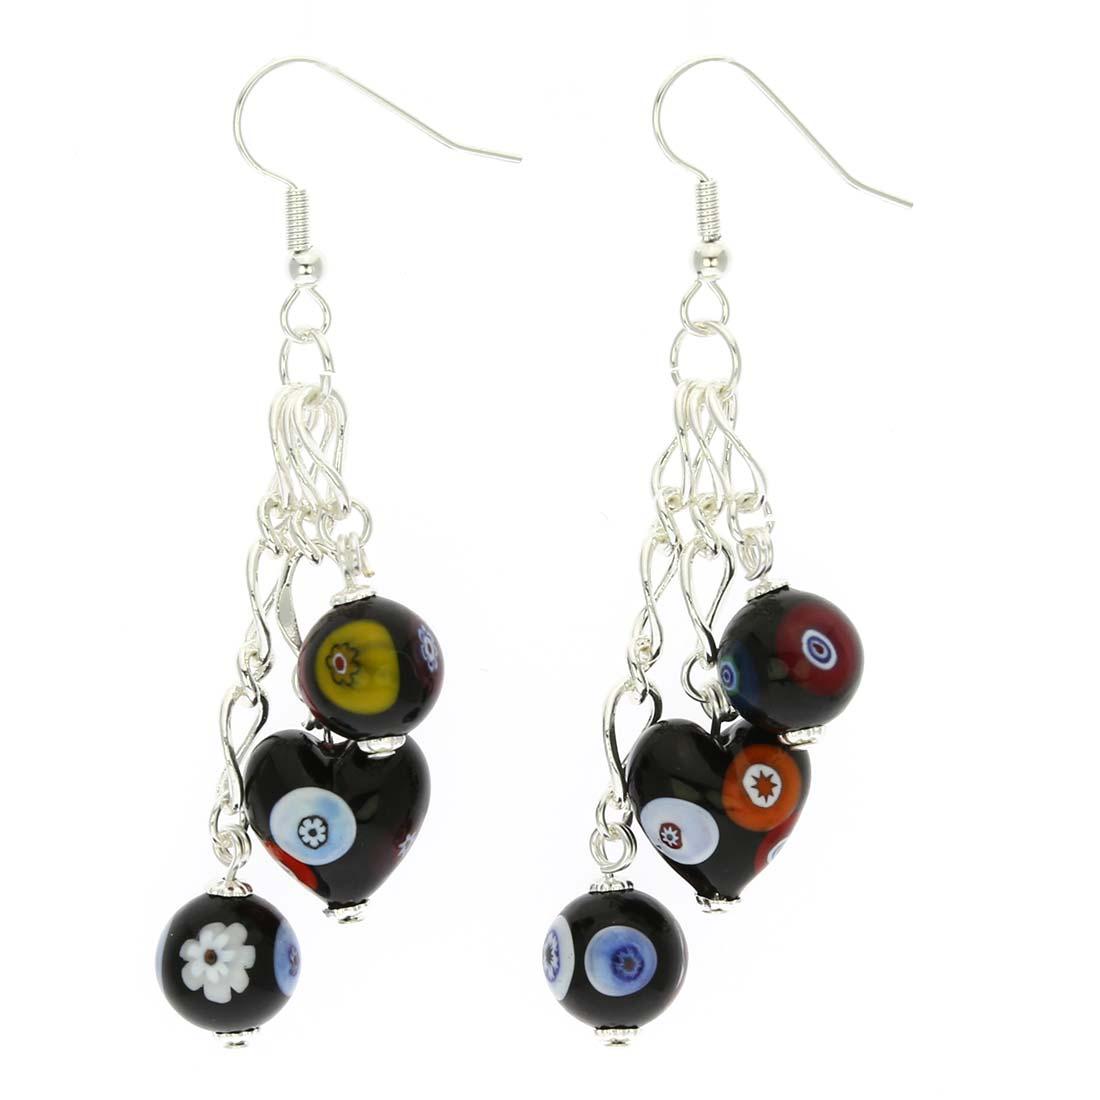 Millefiori Fantasy earrings